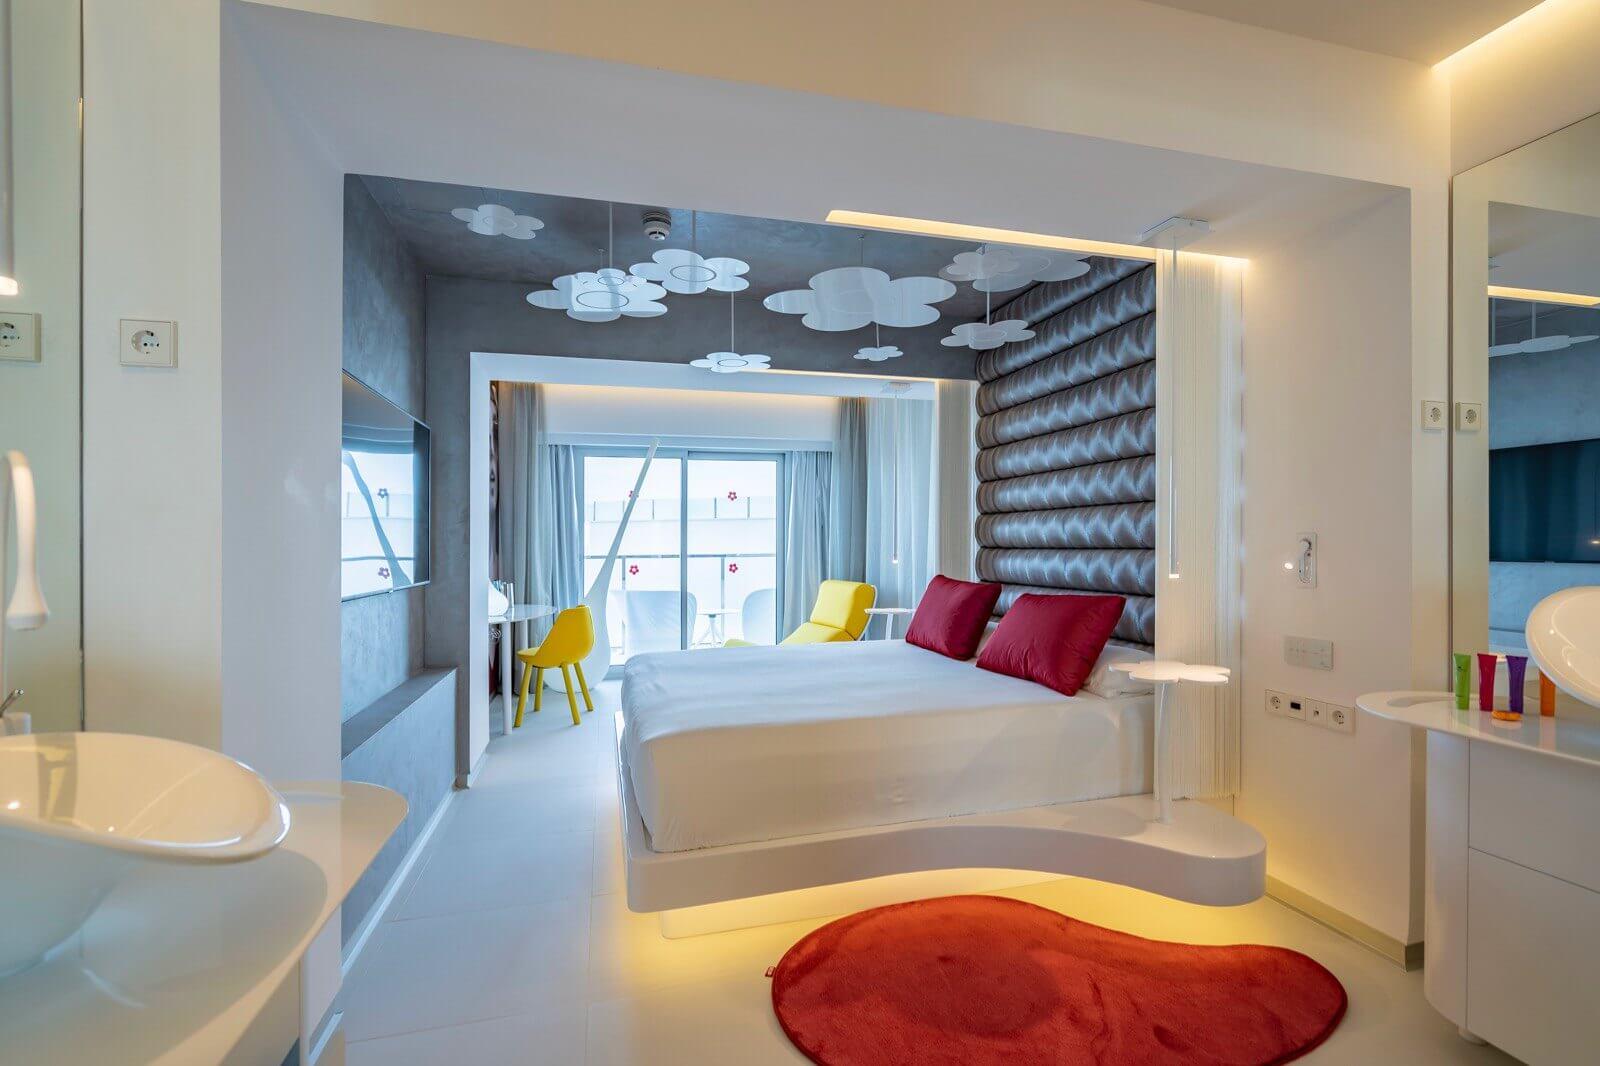 https://www.white-ibiza.com/wp-content/uploads/2020/03/formentera-hotels-five-flowers-2020-07.jpg